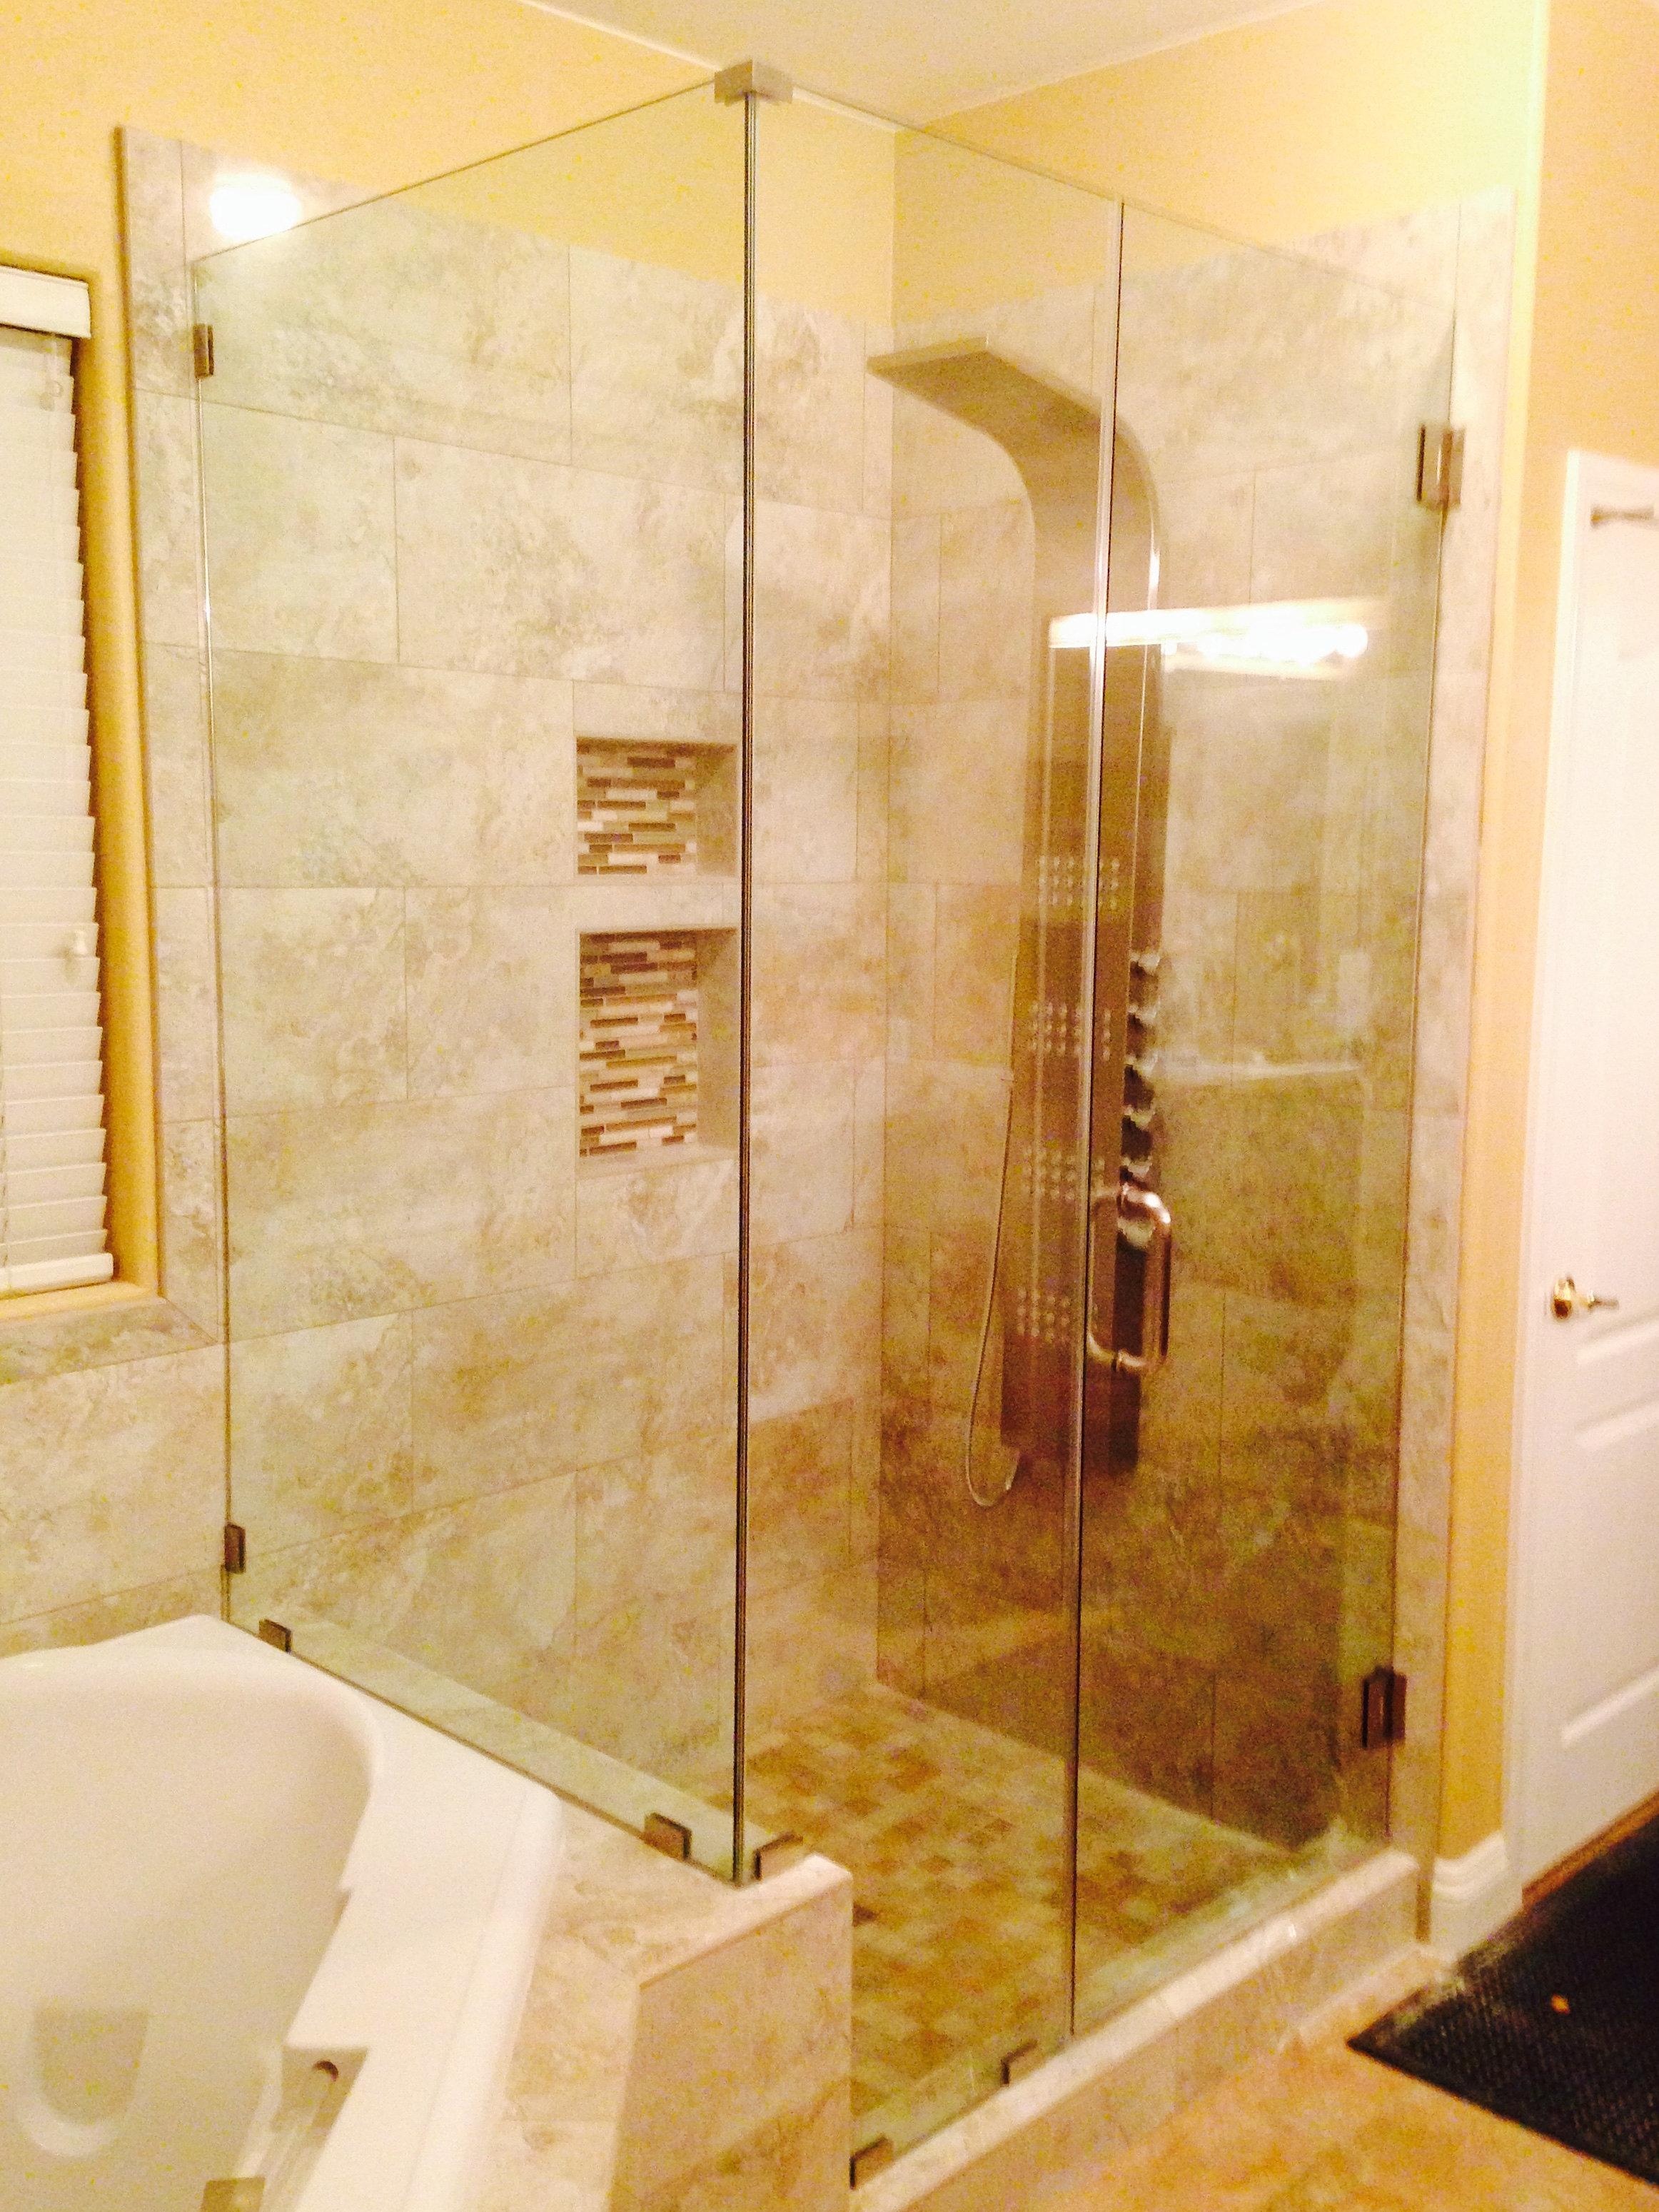 5220 Bathroom Remodel Fix Bathroom Shower Replace Bathroom Shower Picture  Of Replacement Bathroom Doors 2324 3098